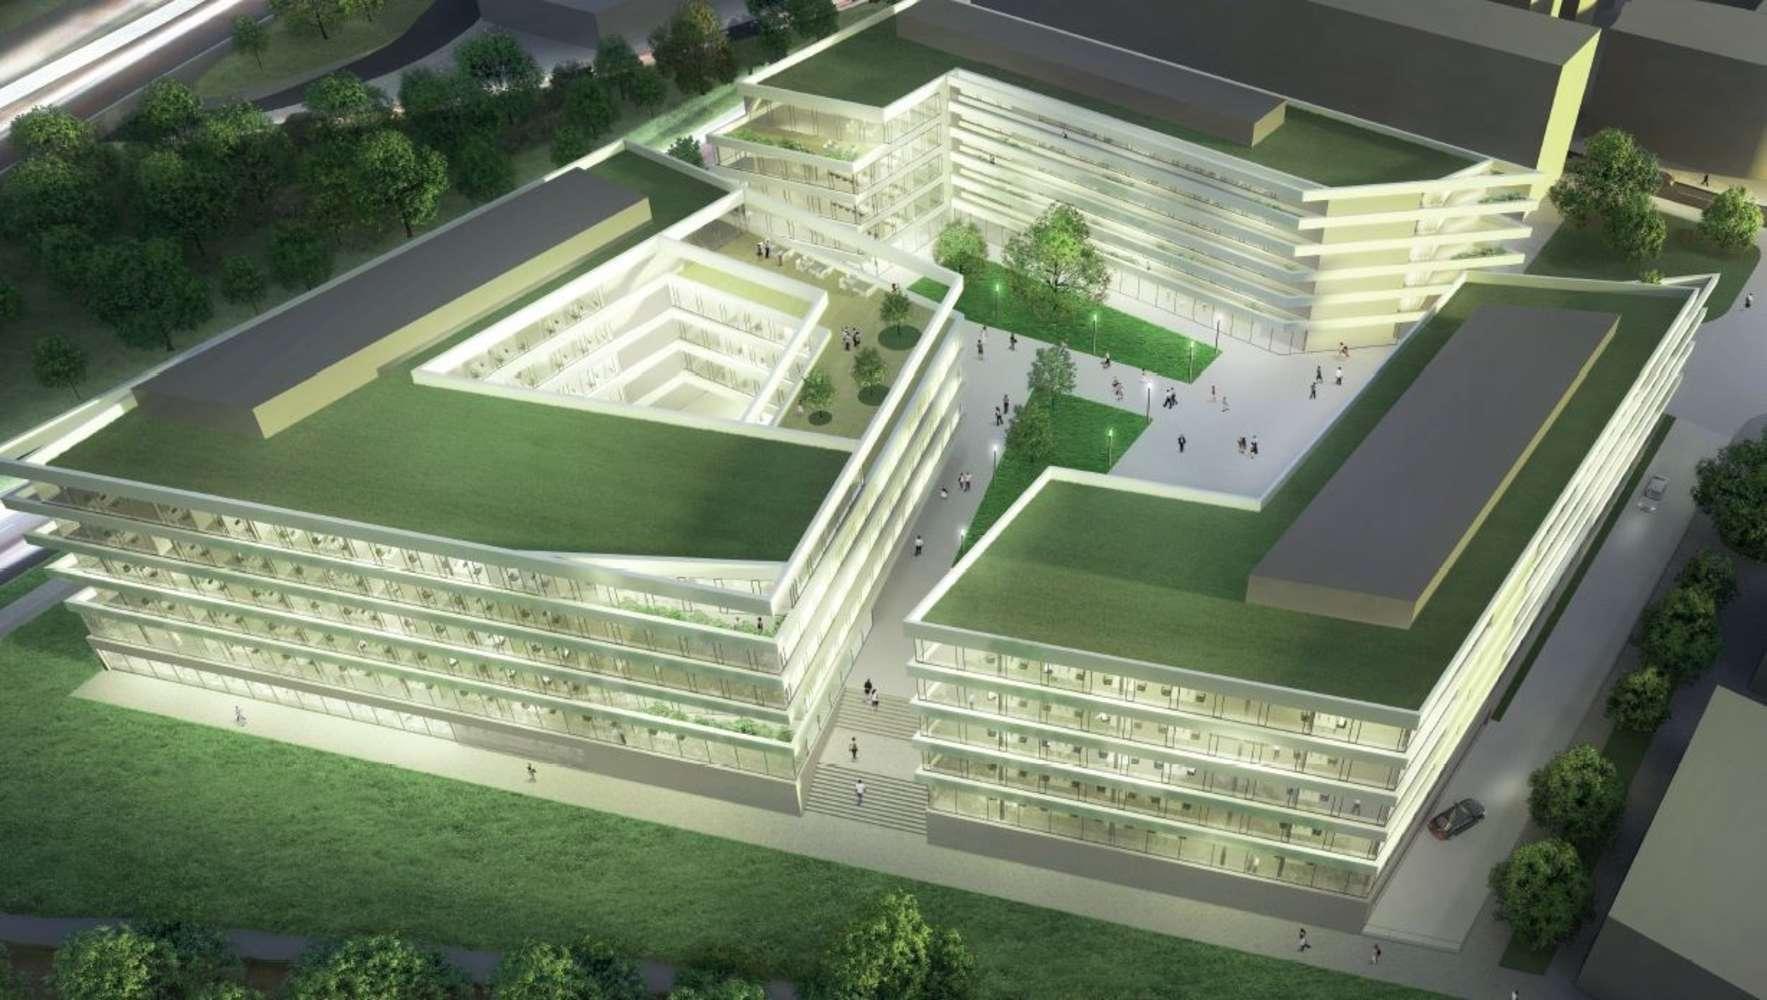 Büros Leinfelden-echterdingen, 70771 - Büro - Leinfelden-Echterdingen, Echterdingen - S0623 - 10622307